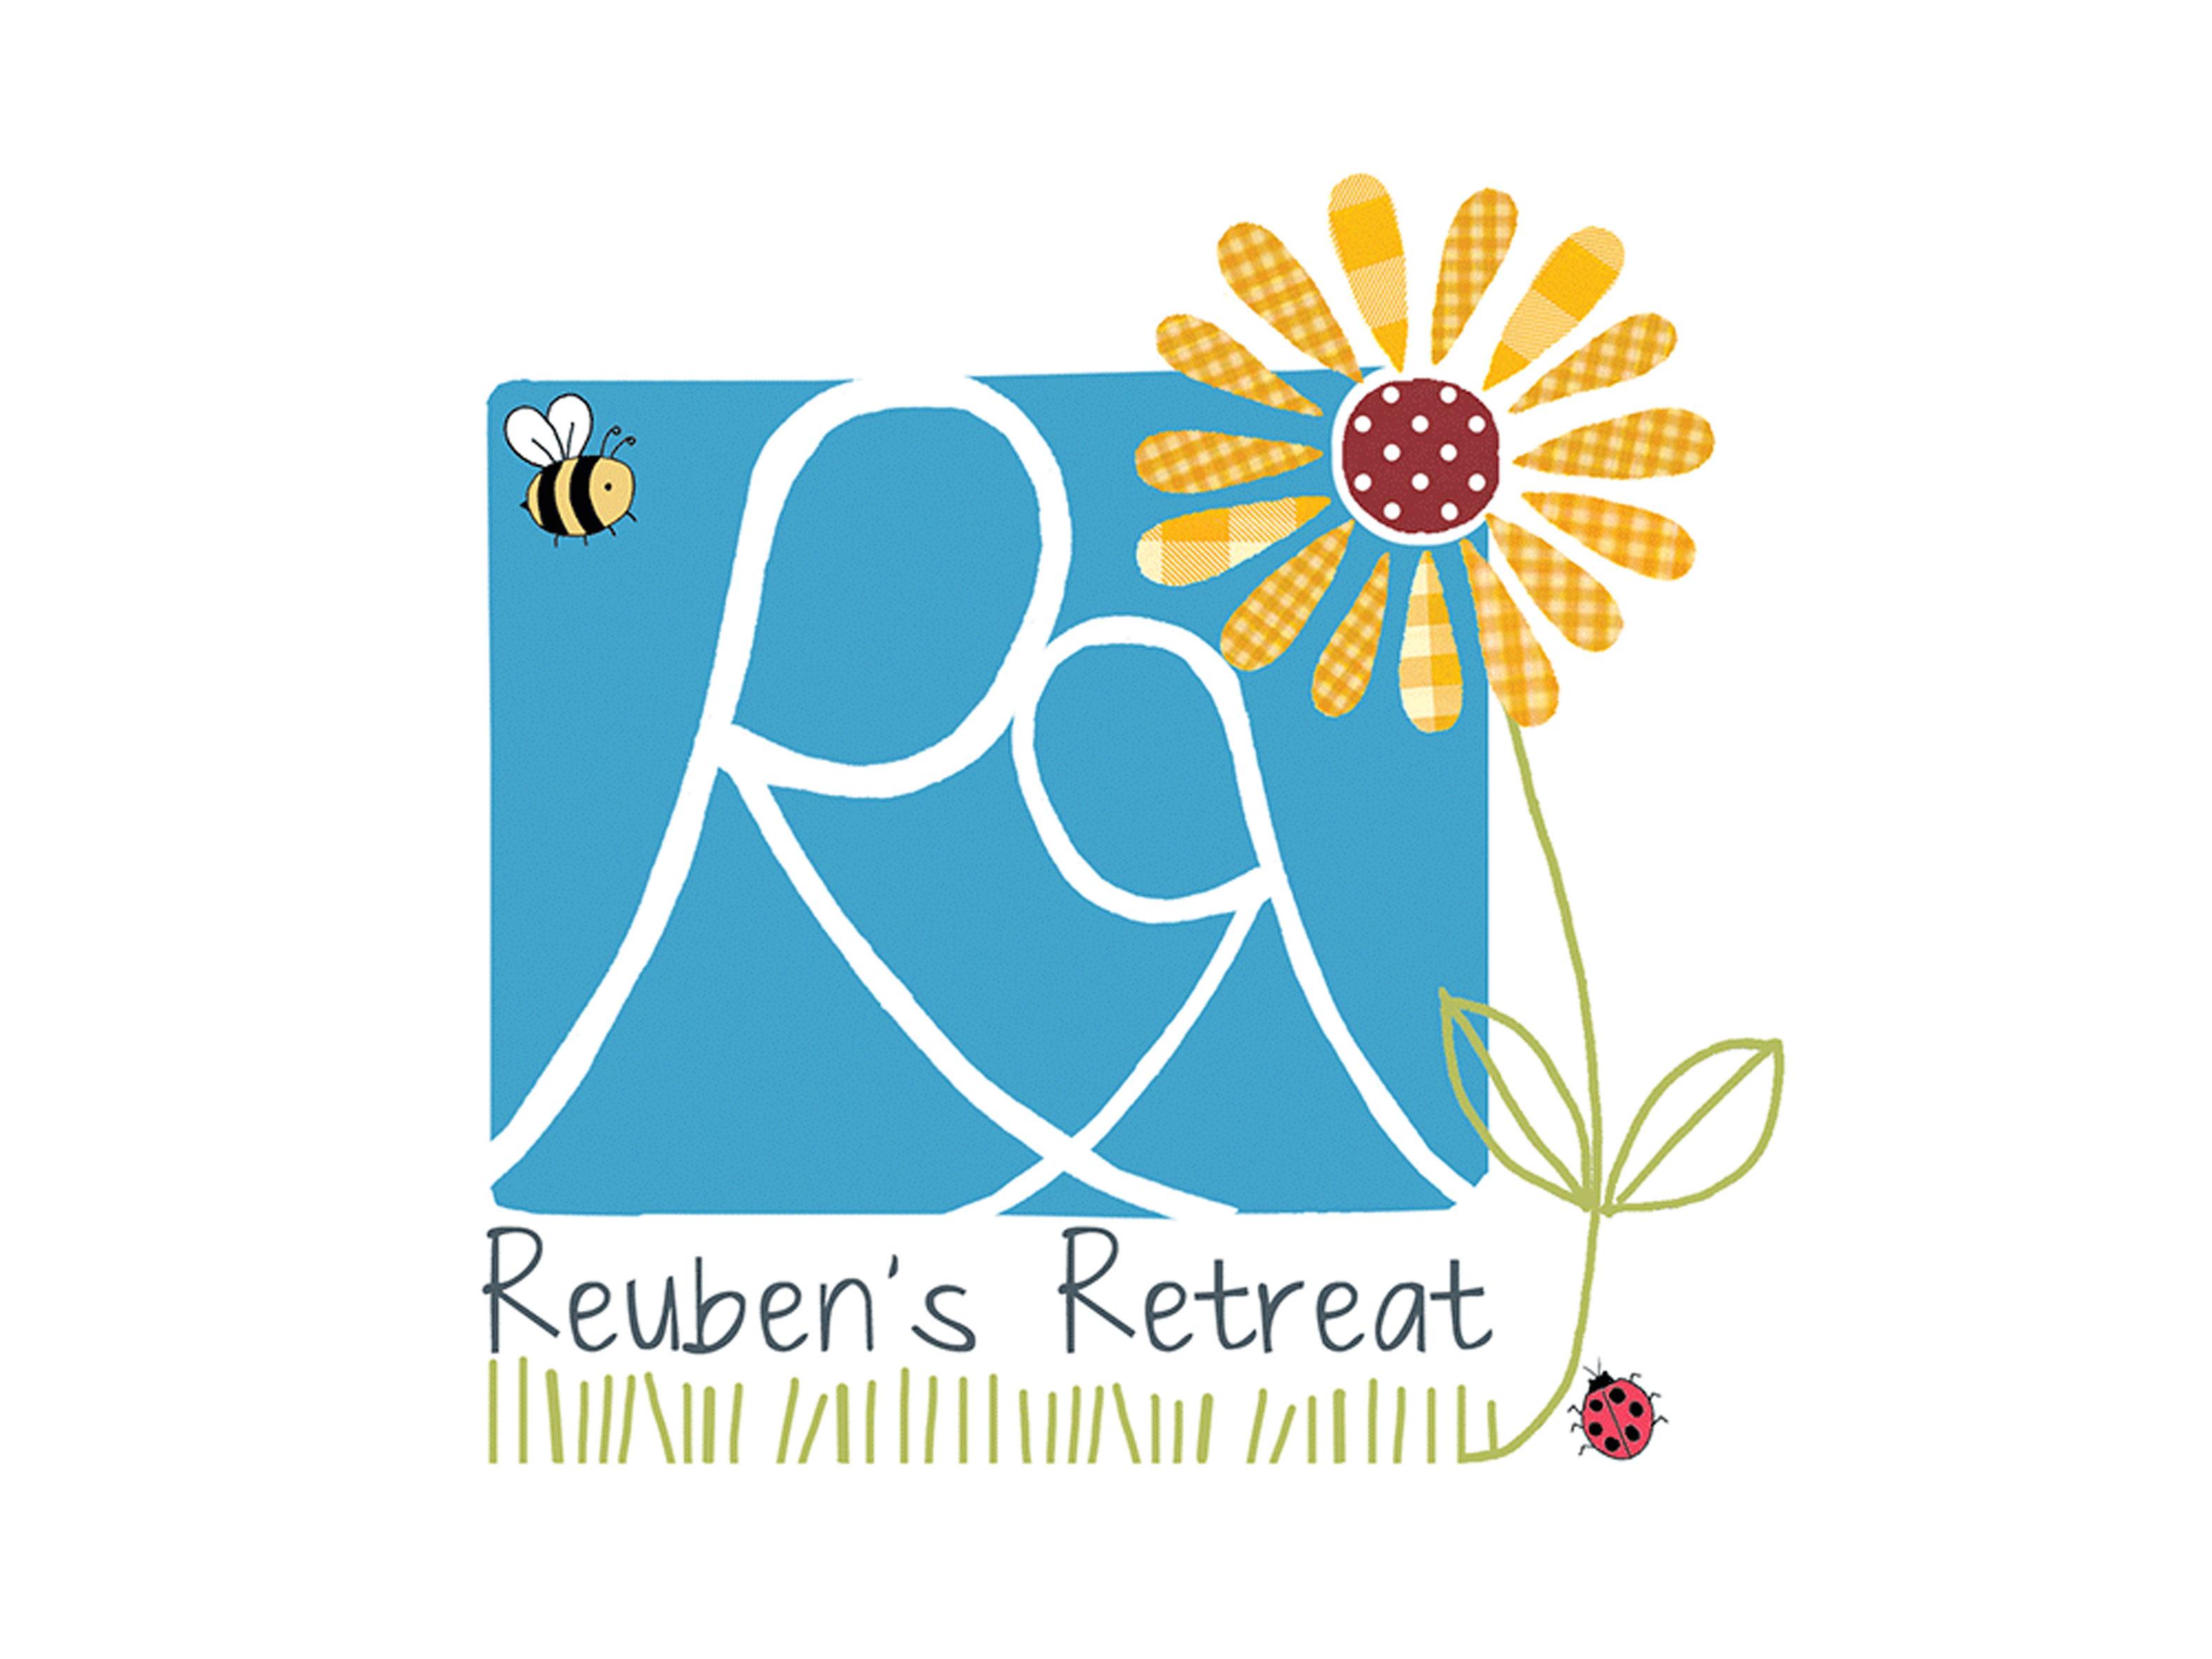 Charity Reubens retreat